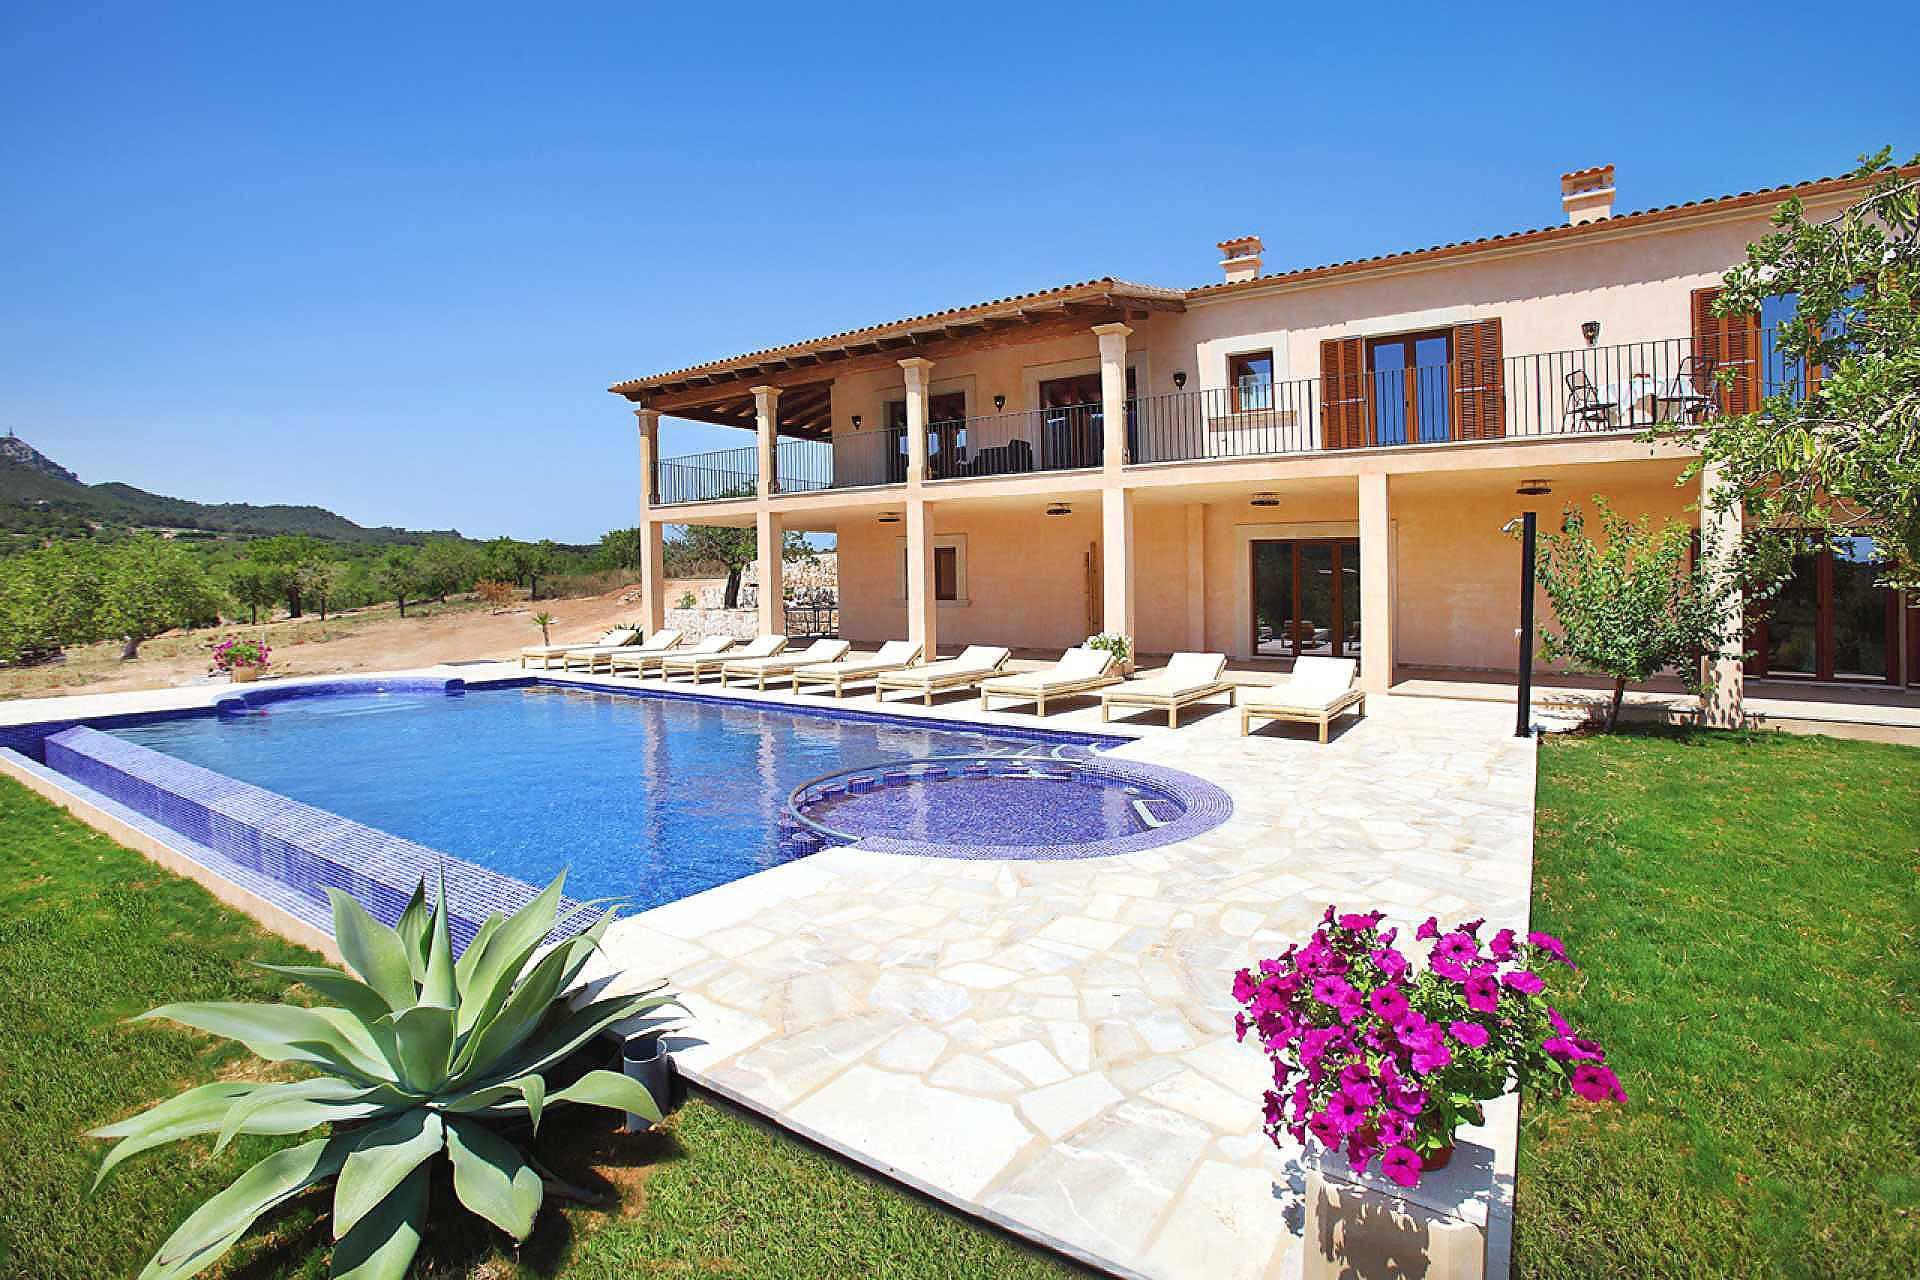 01-45 Exclusive Finca Mallorca East Bild 3